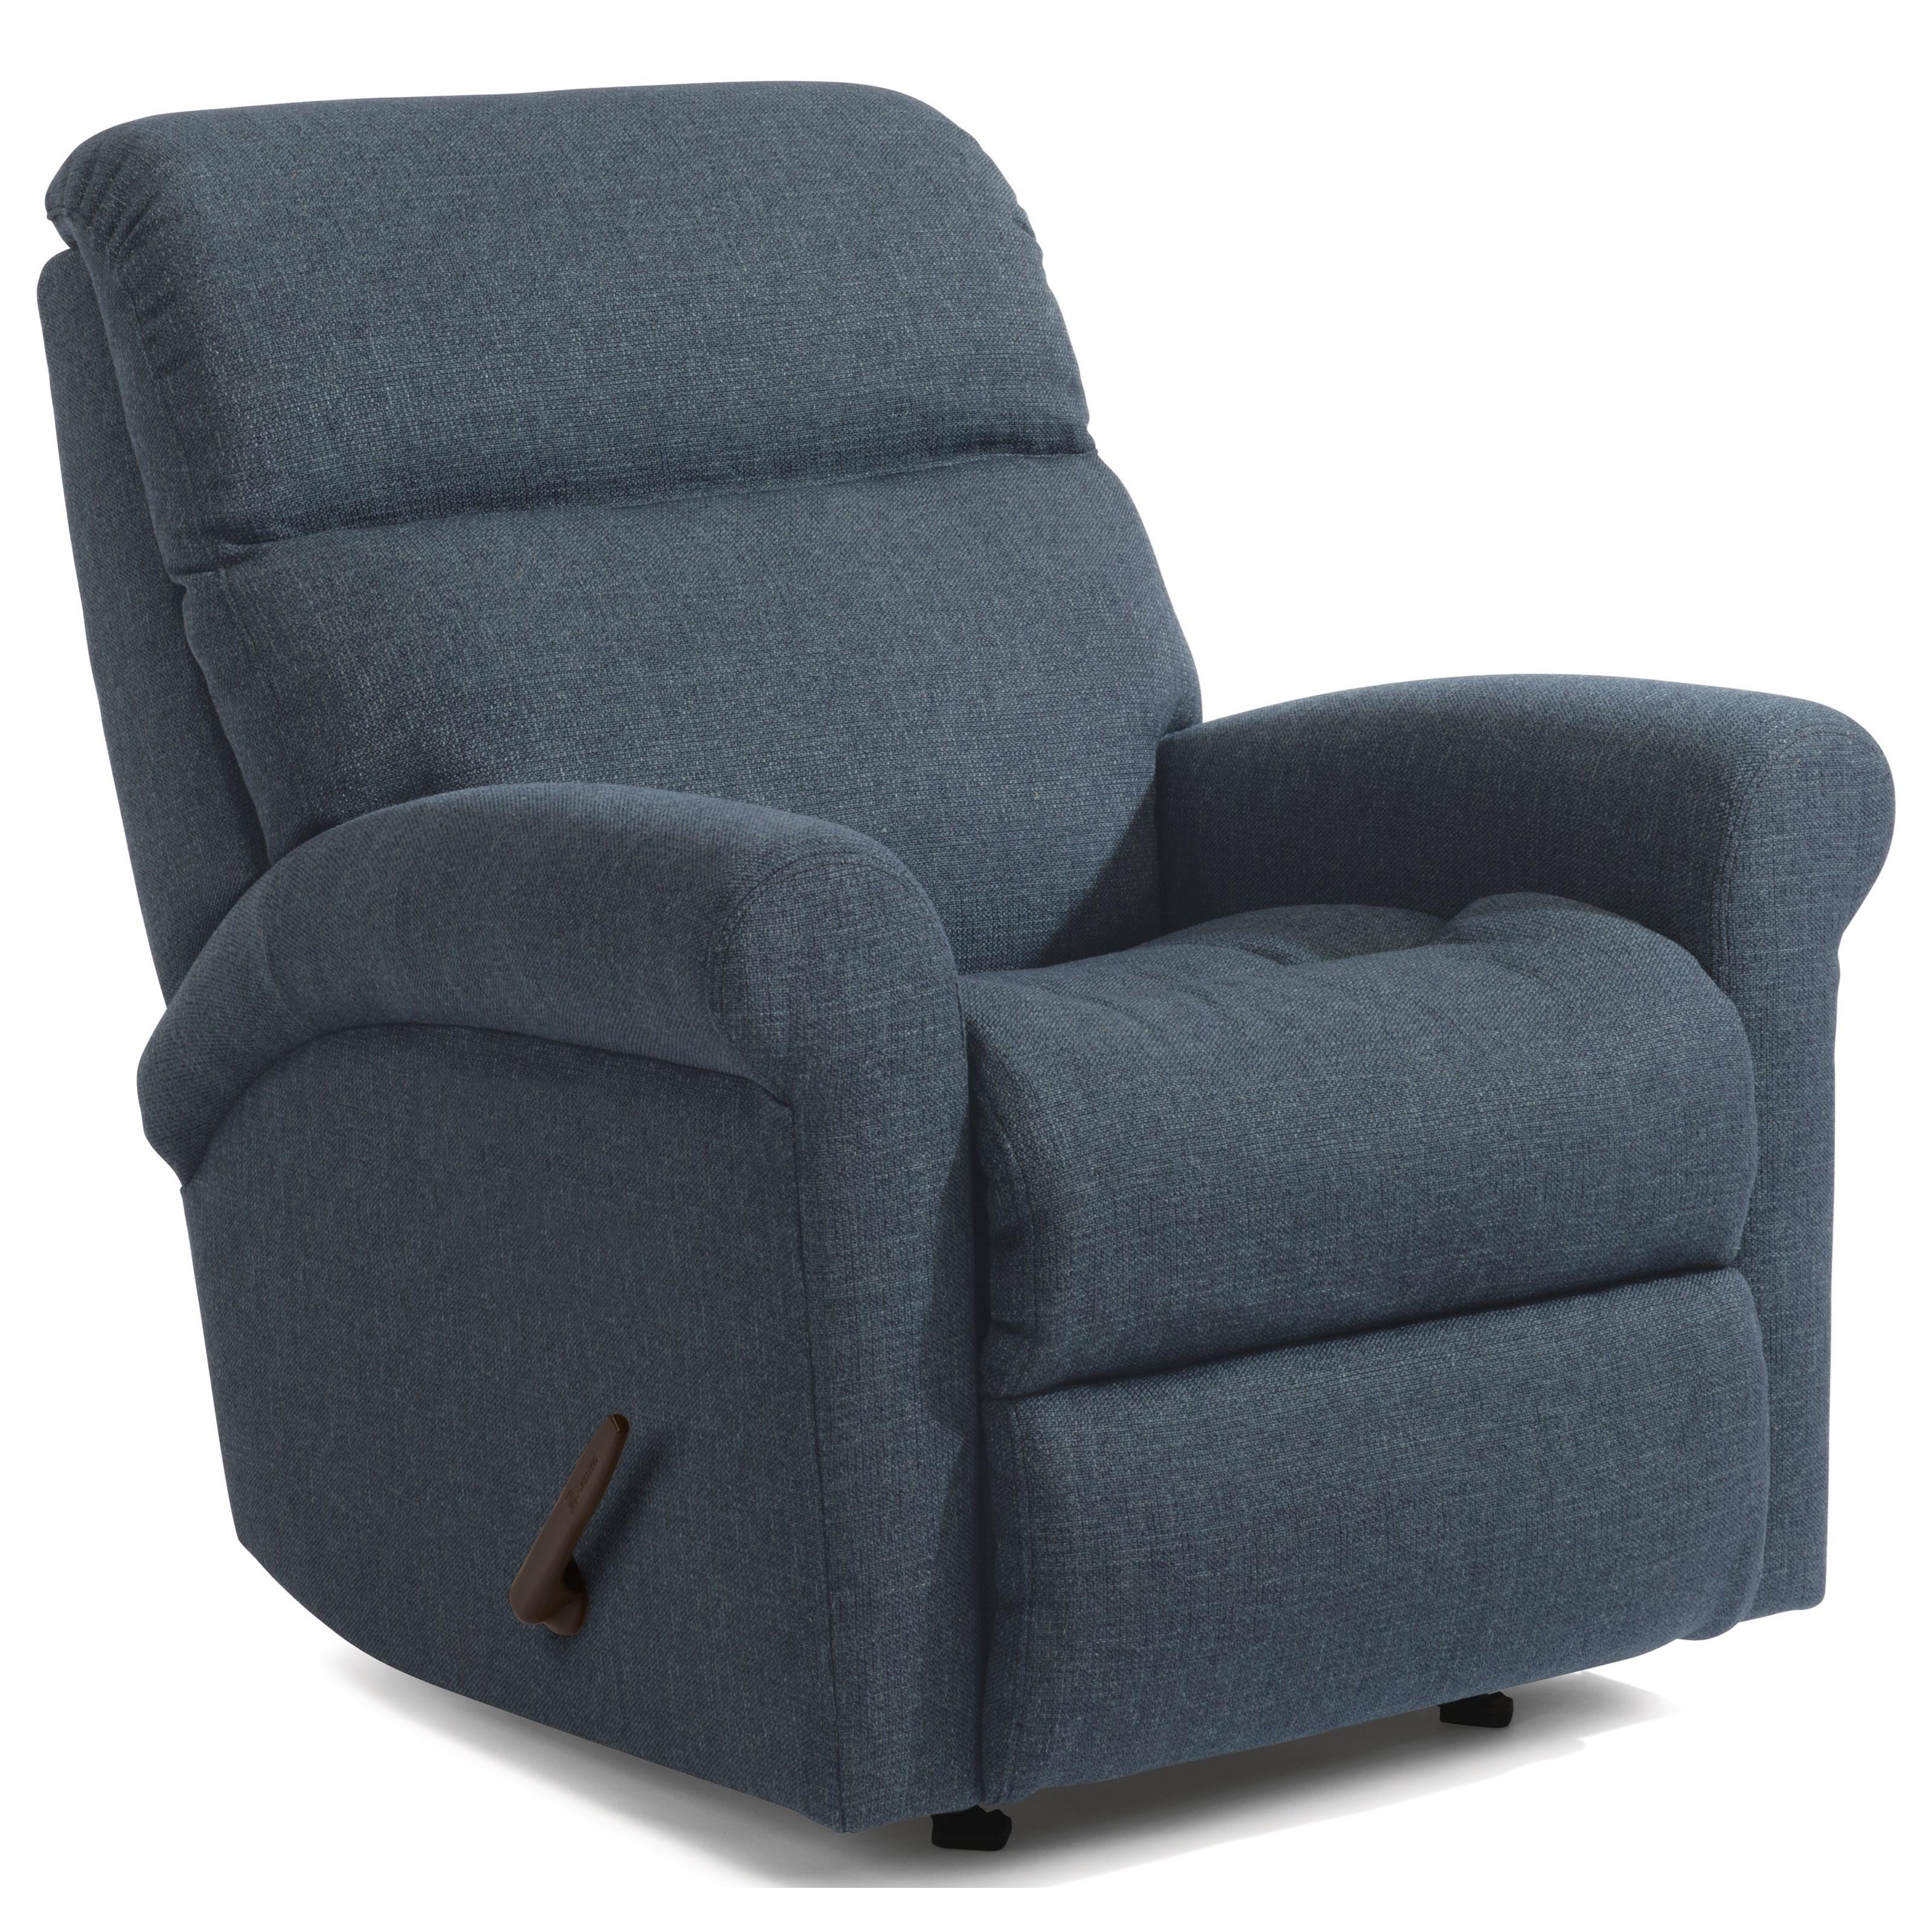 Davis Recliner by Flexsteel at Suburban Furniture